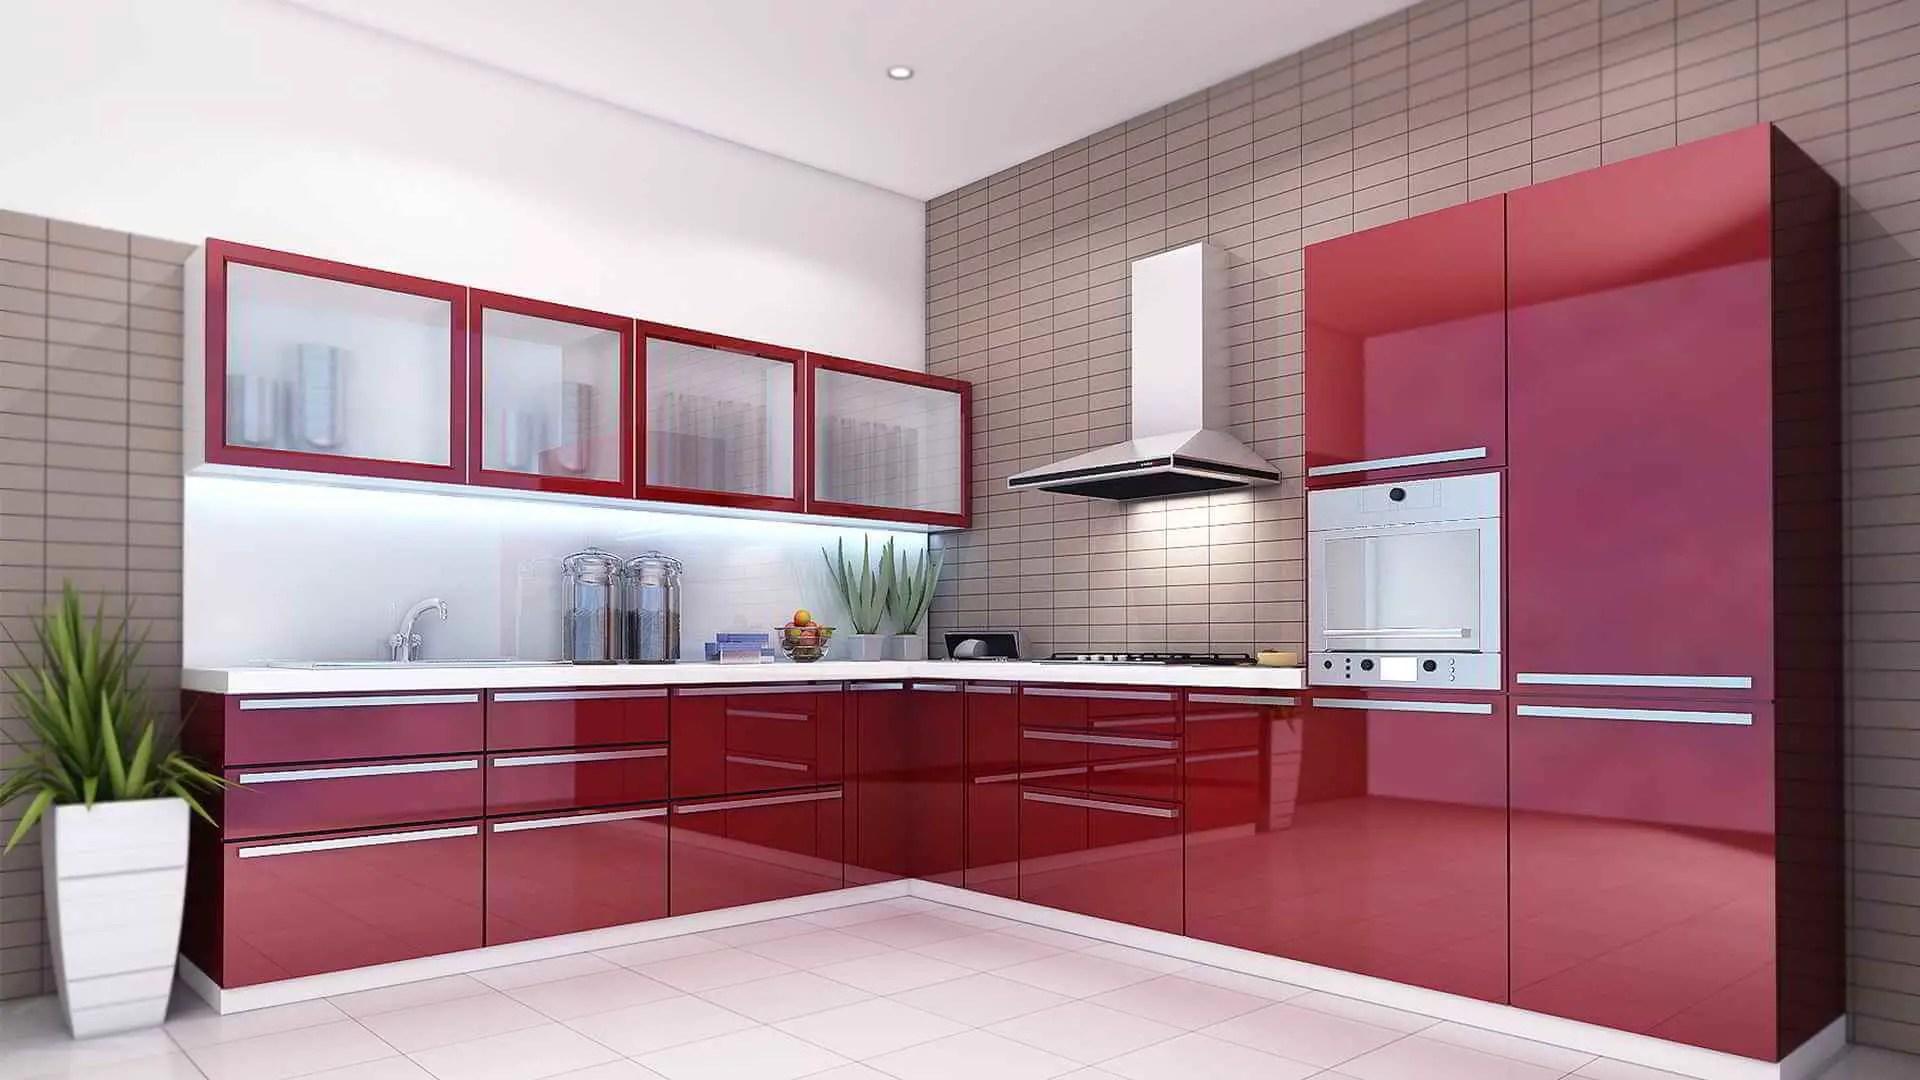 having a modern kitchen